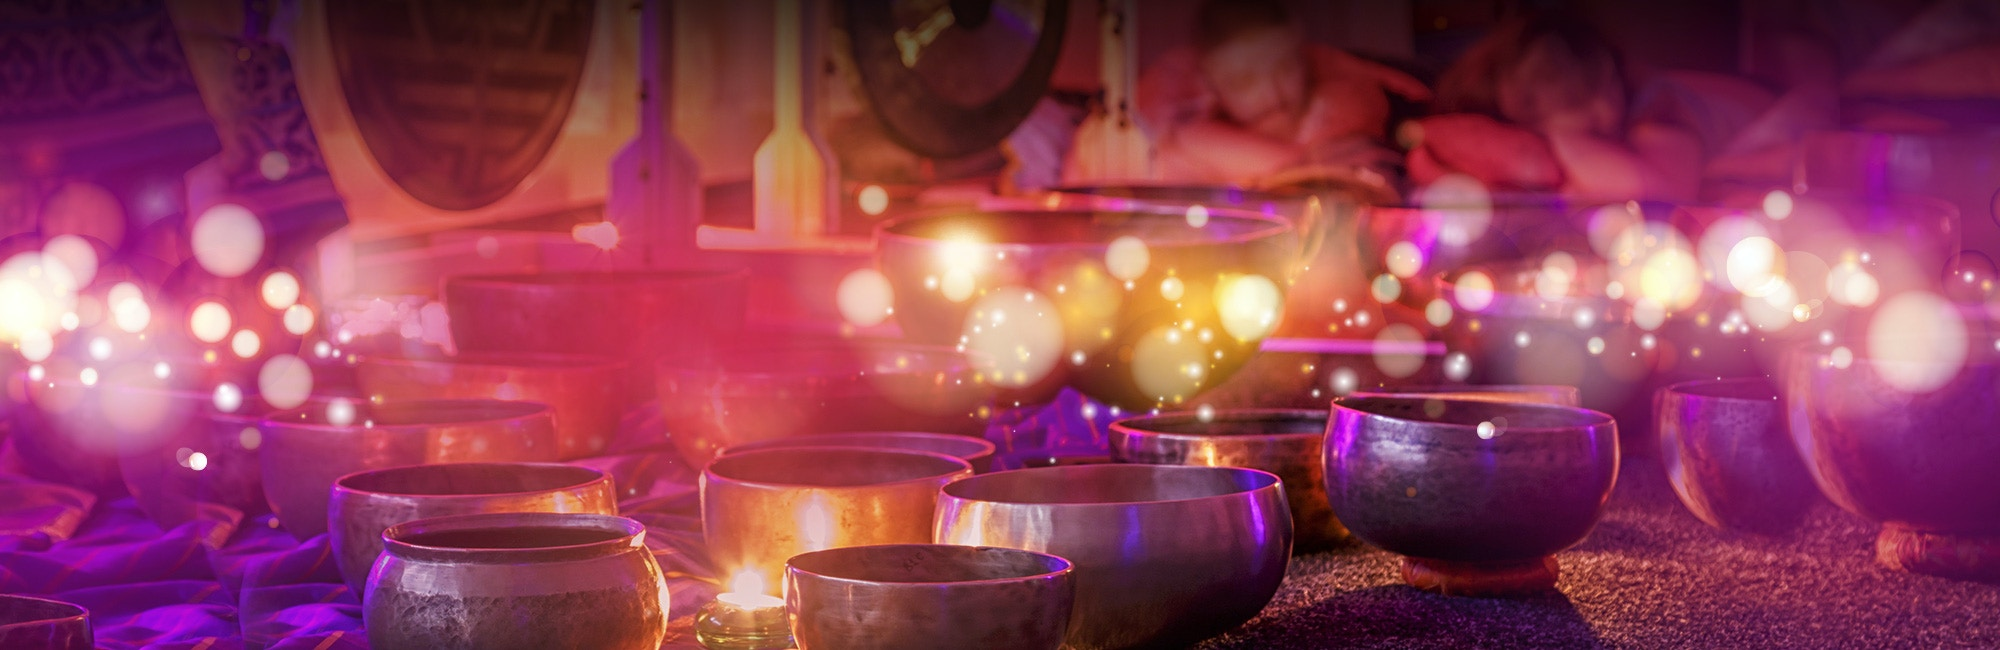 Sound, Alchemy, and Your Divine Blueprint